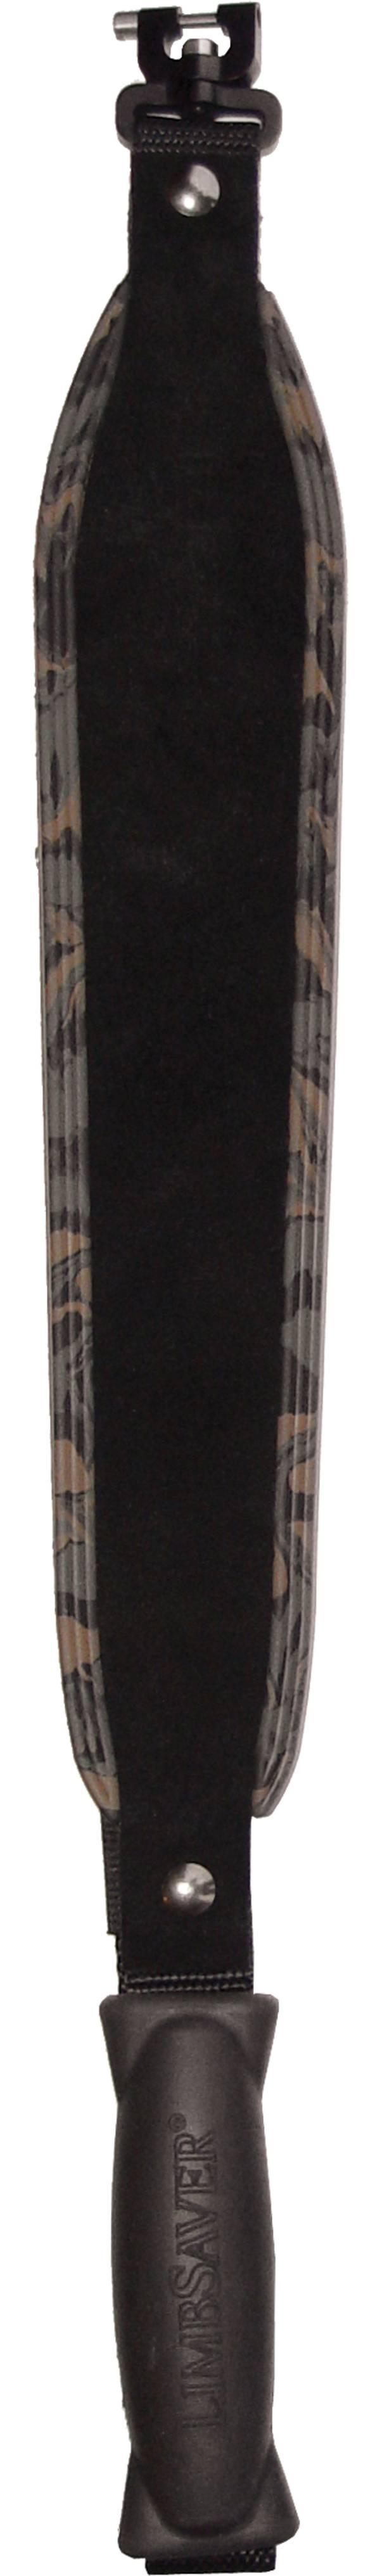 LimbSaver Kodiak Lite Crossbow Slings - Camo product image